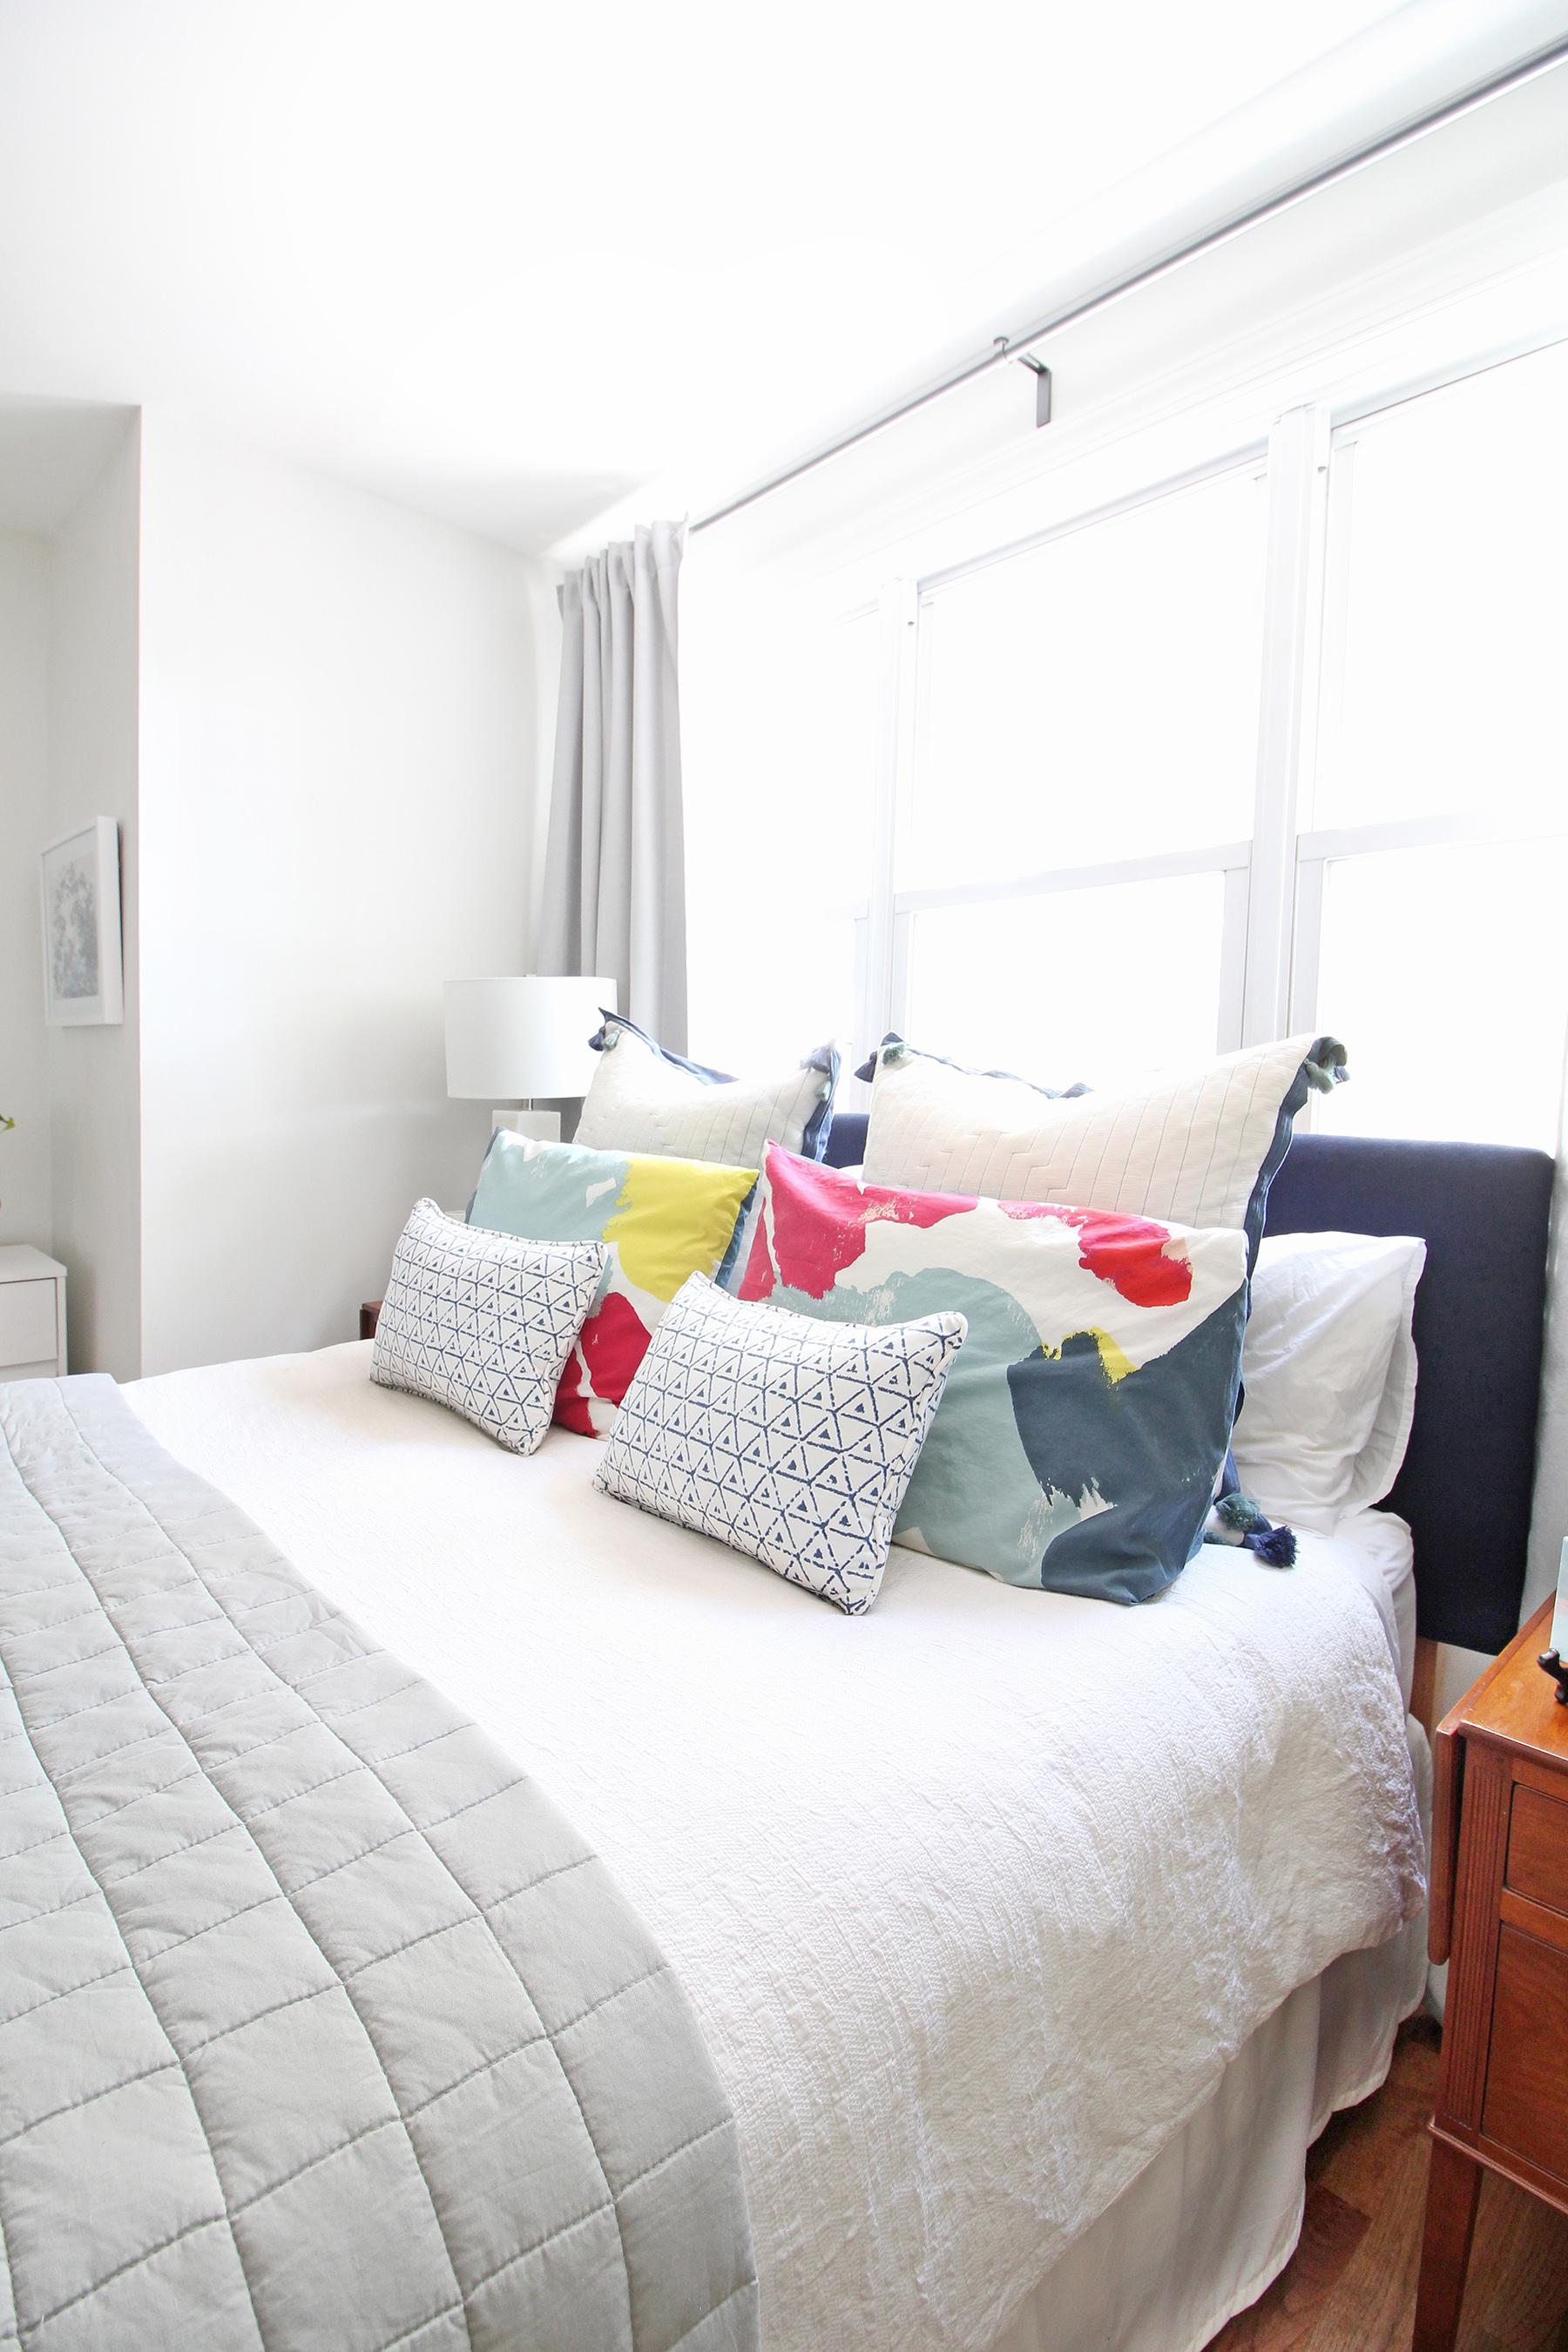 Modern-Eclectic-Bedroom-Refresh-Legrand-USB-Outlet-Web-7.jpg